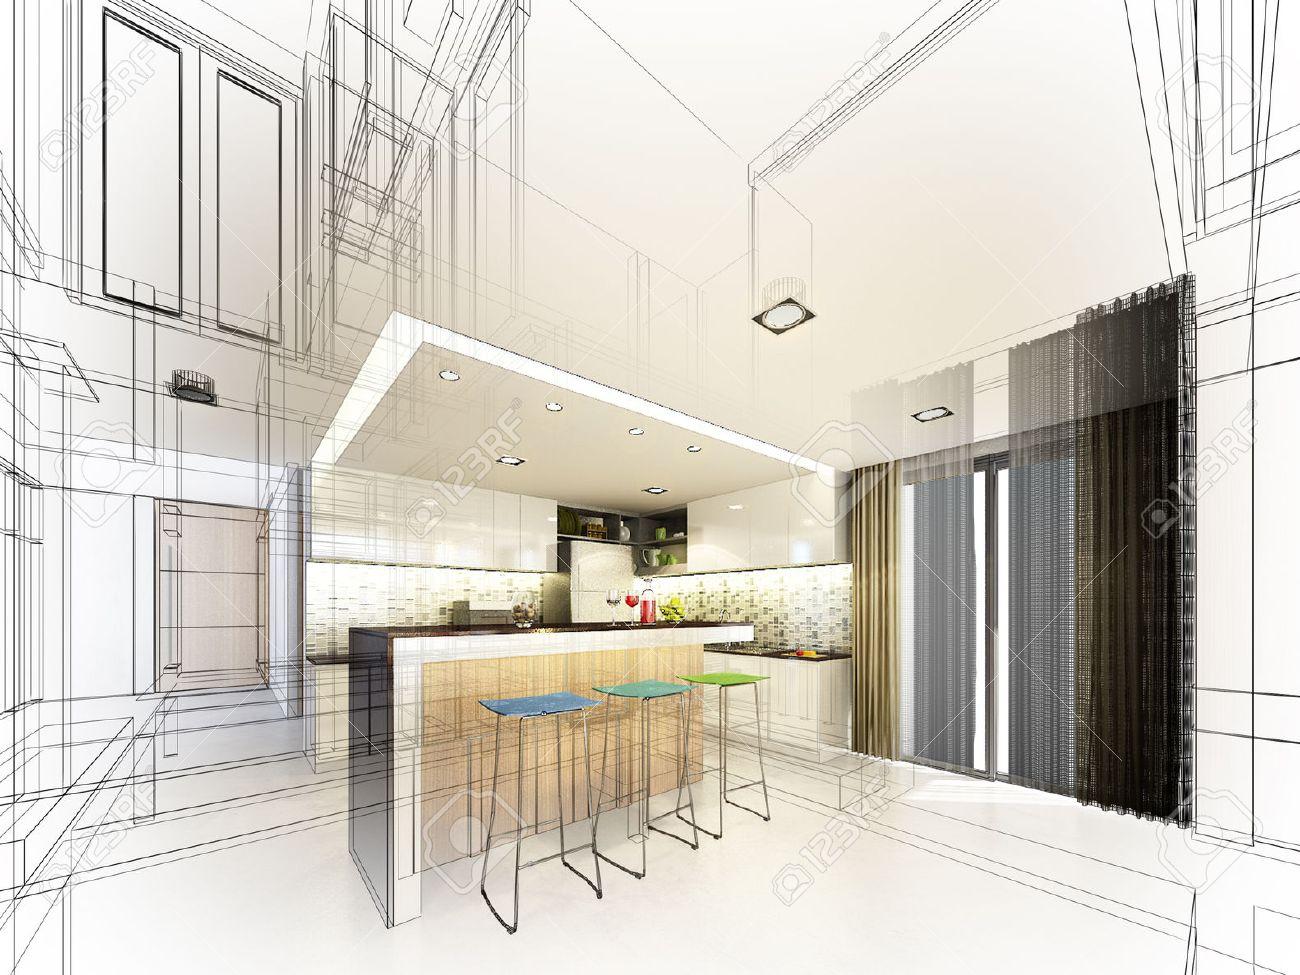 Abstract sketch design of interior kitchen - 33218544